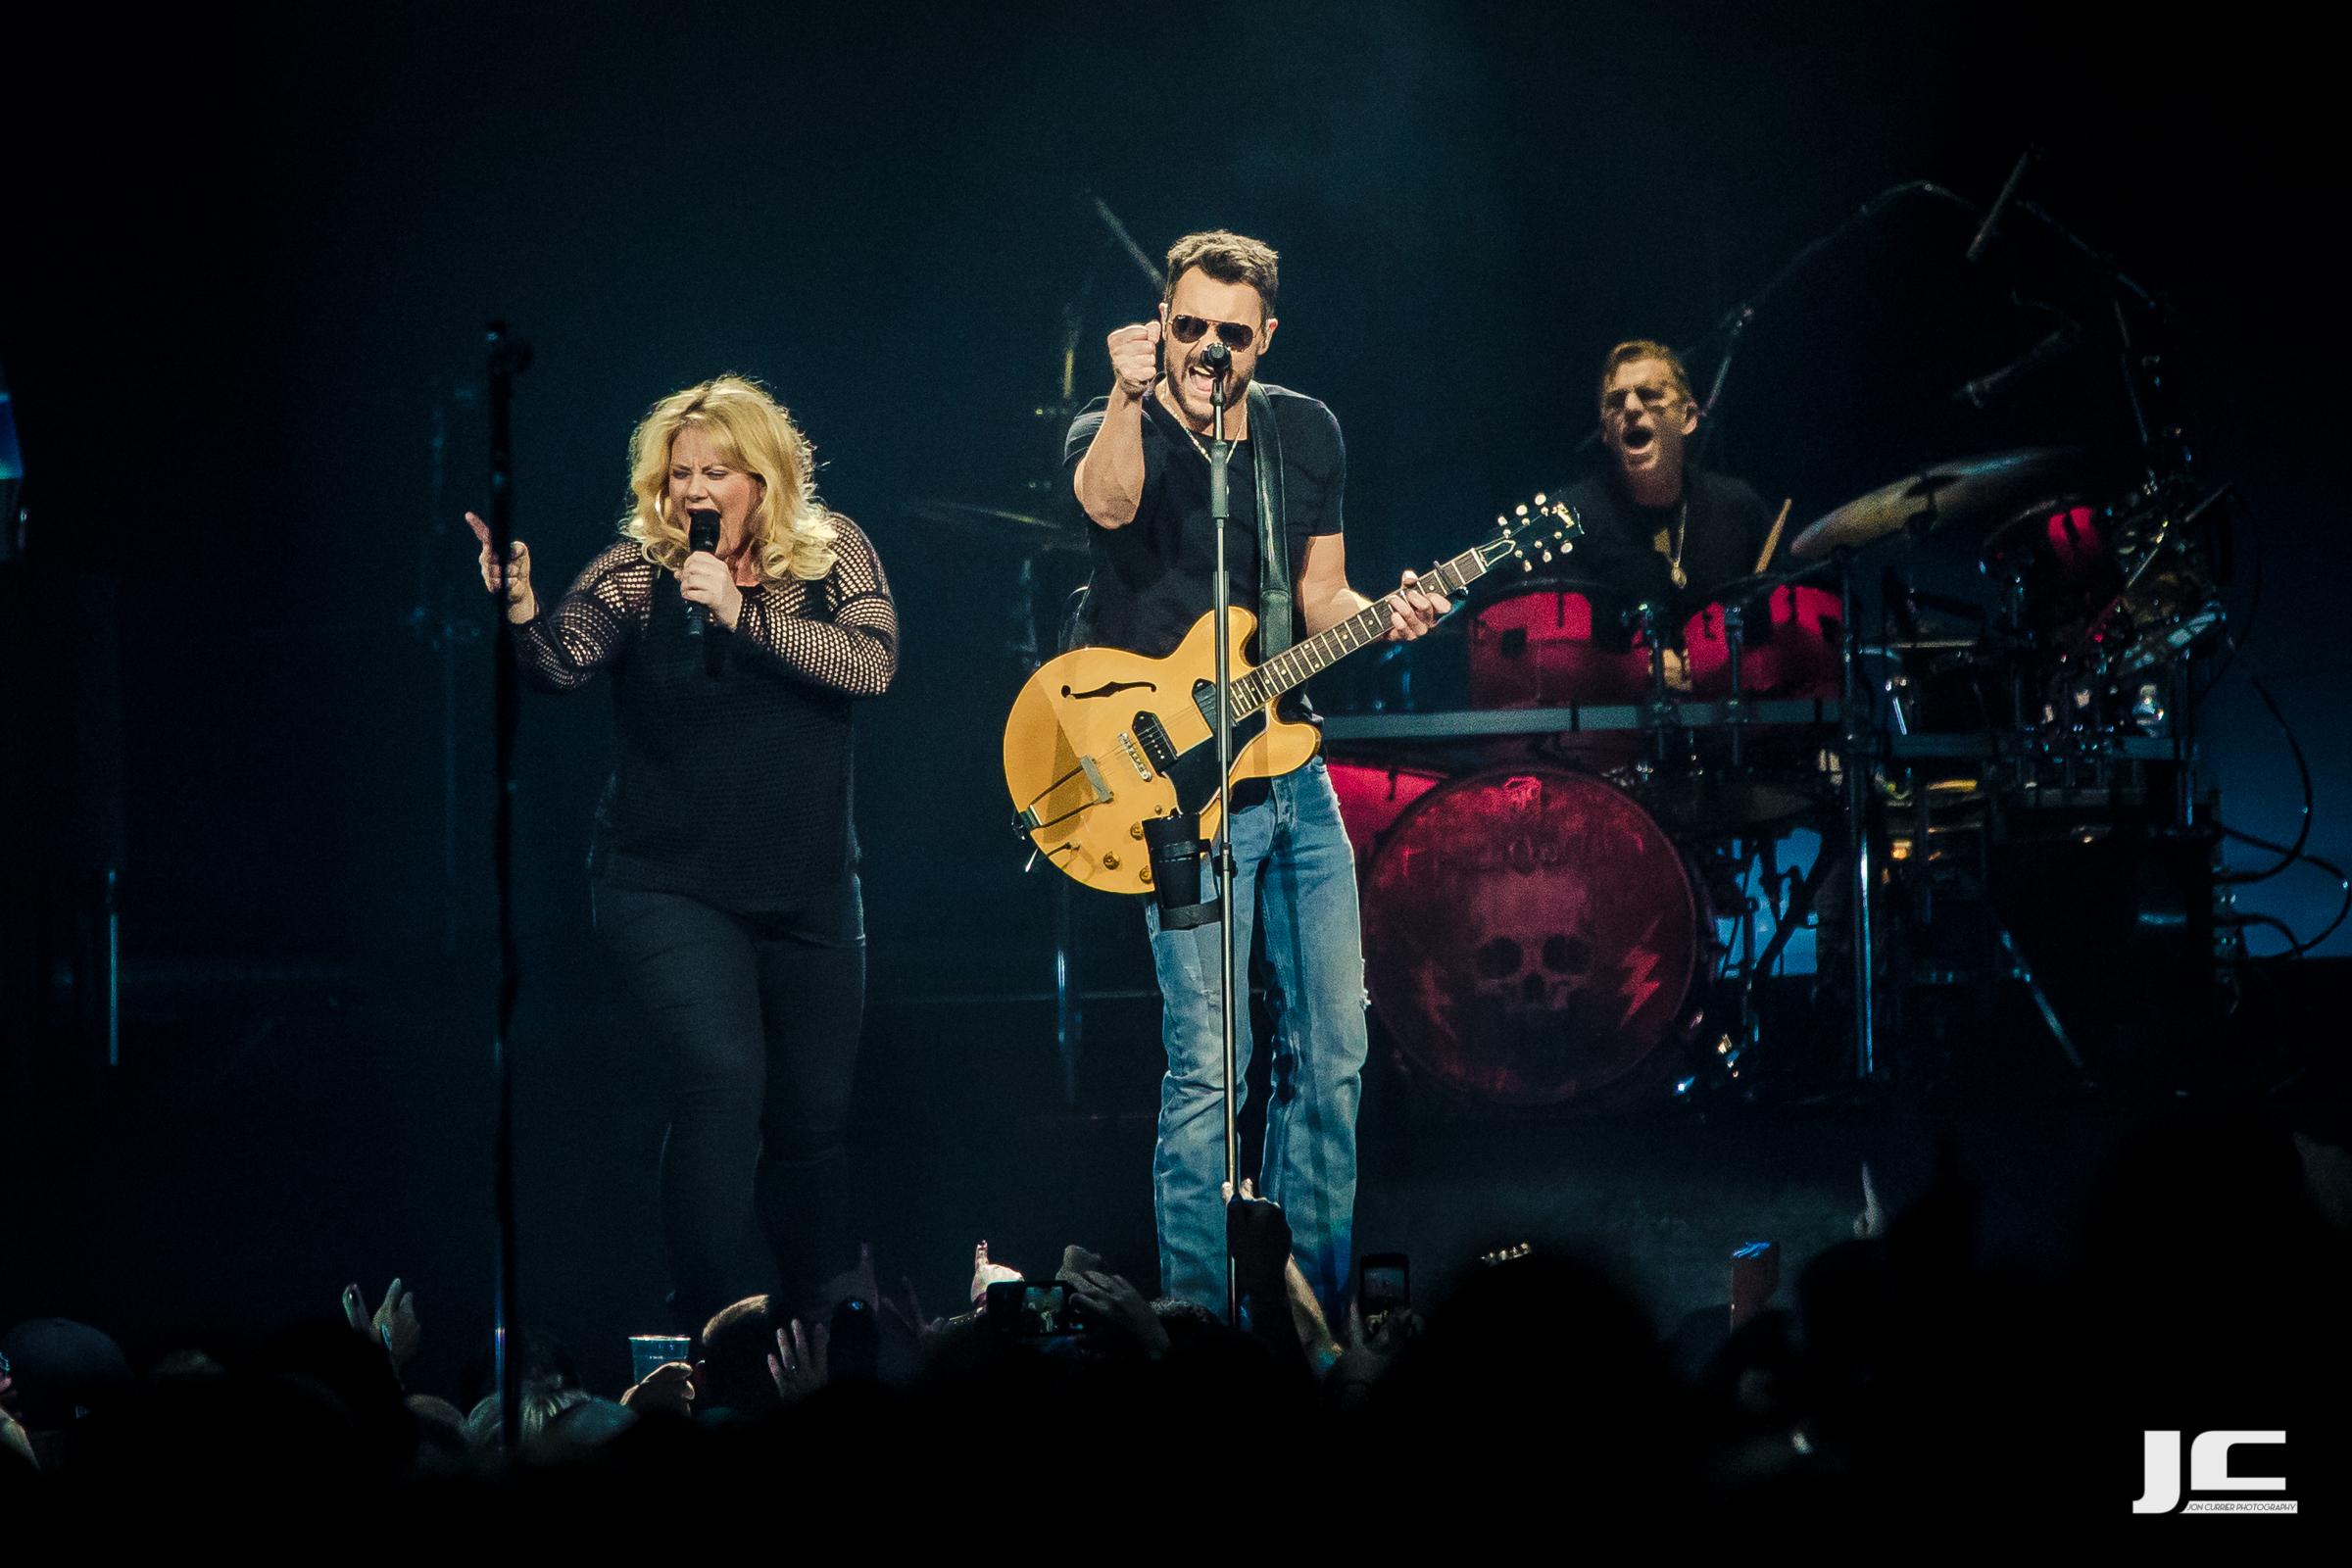 Eric Church Concert Photo Credit Jon Currier Photography